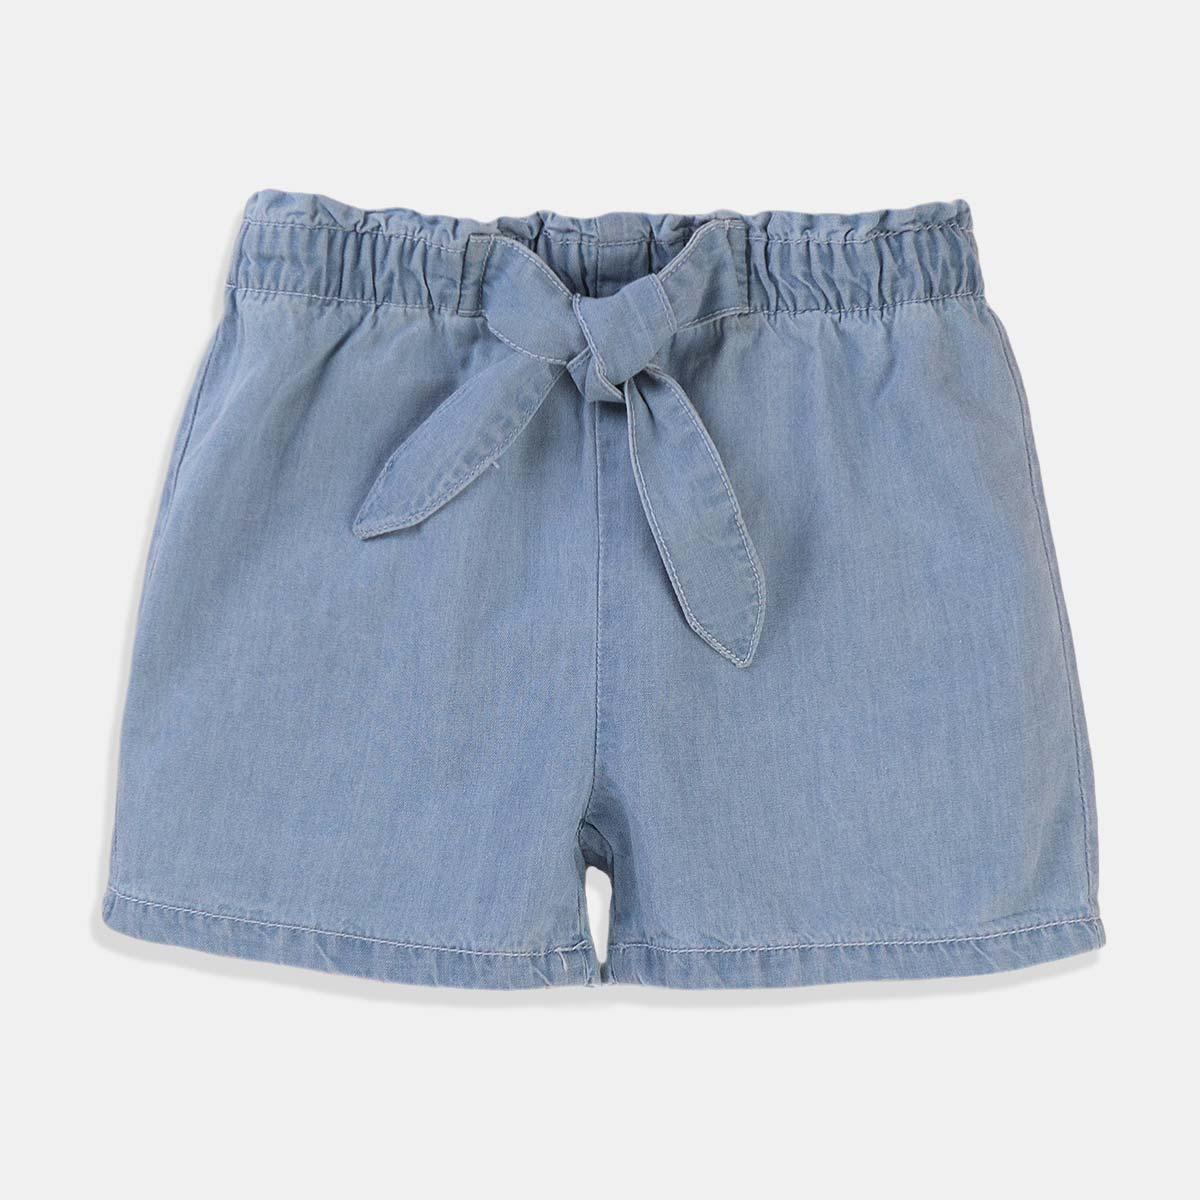 Дънкови къси панталони Minoti за момиче